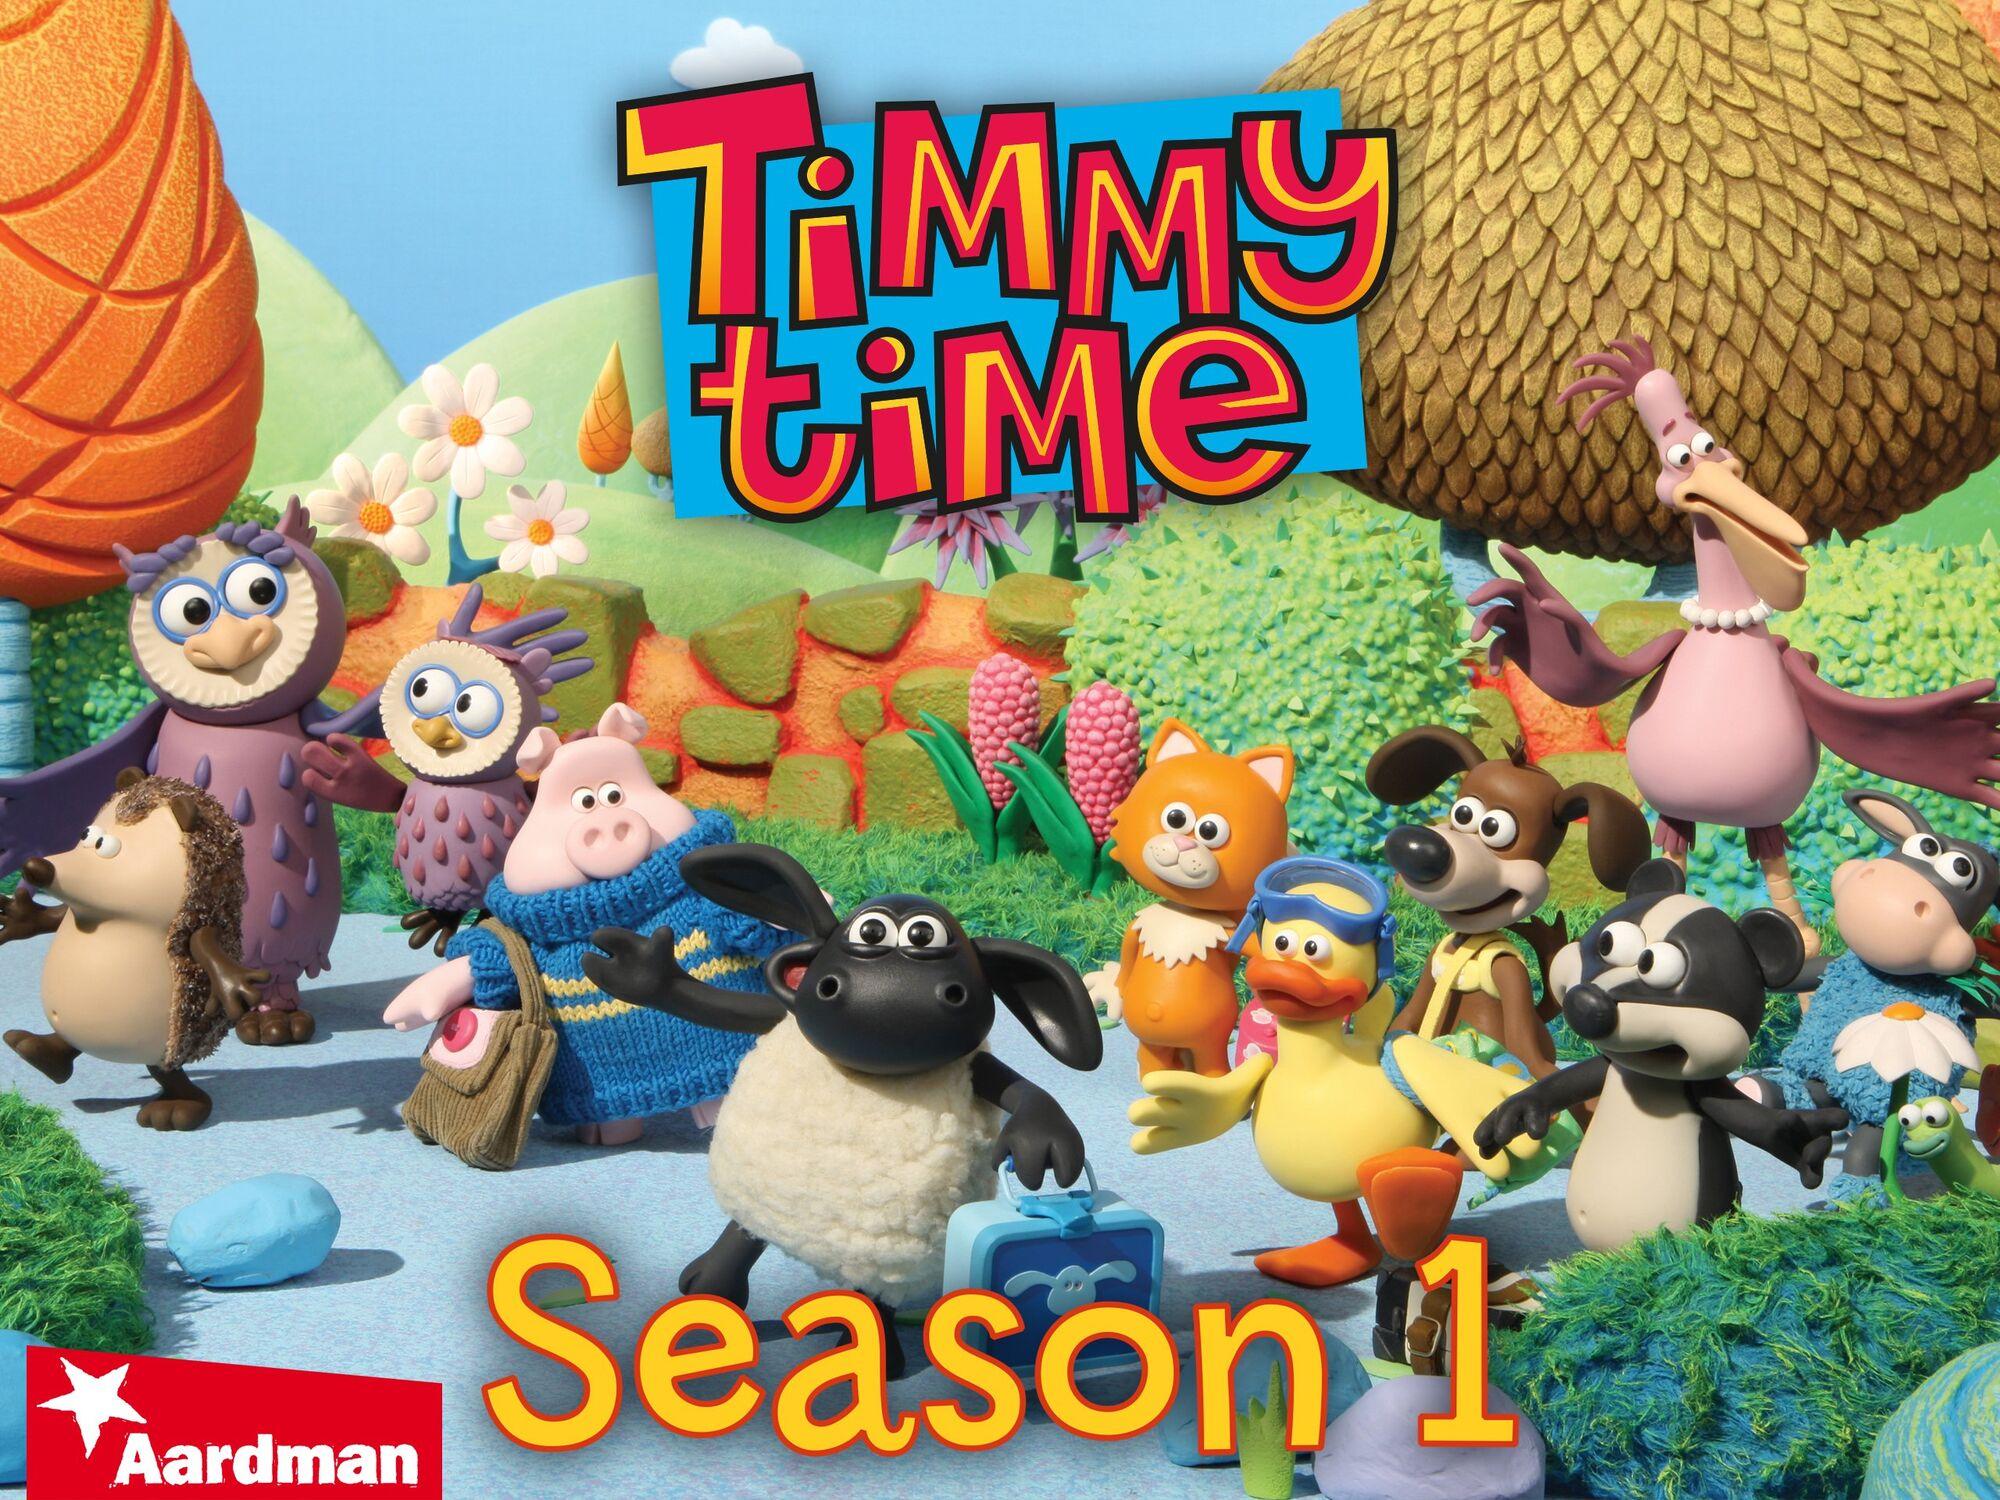 Season 1 Promotional Poster - Melrose Place Photo (7979423